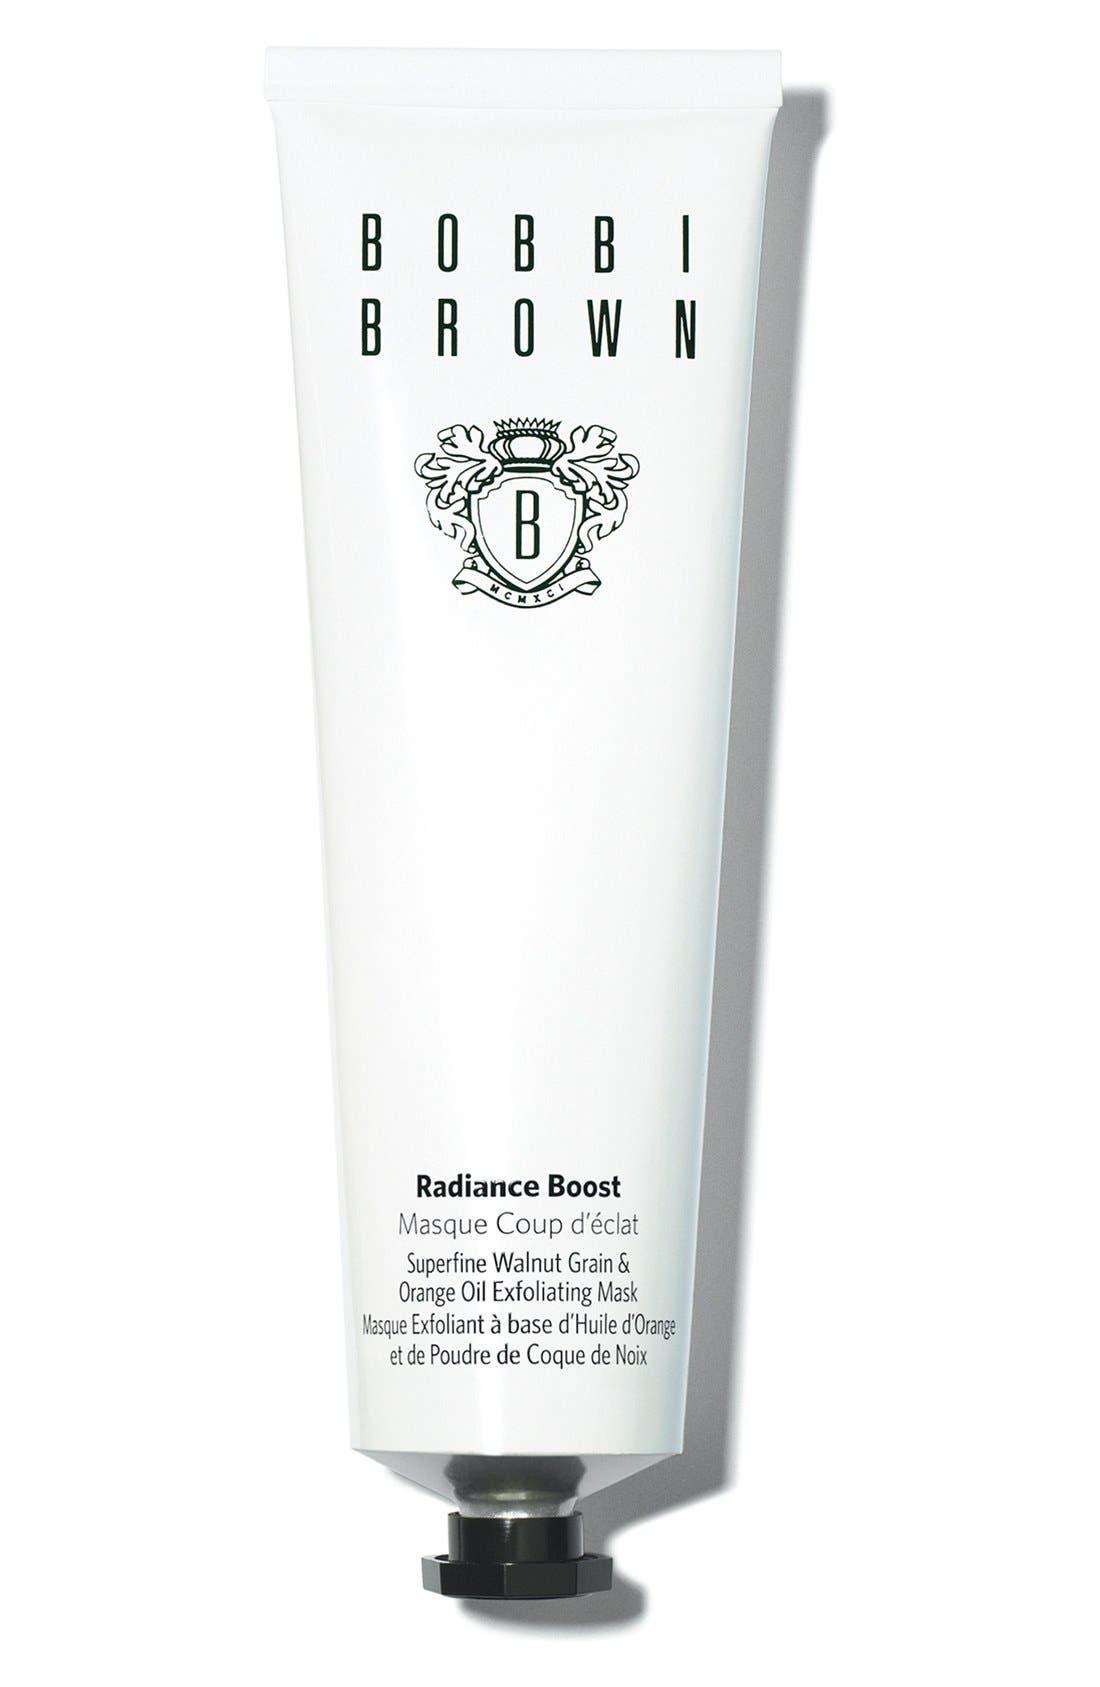 Bobbi Brown Radiance Boost Mask